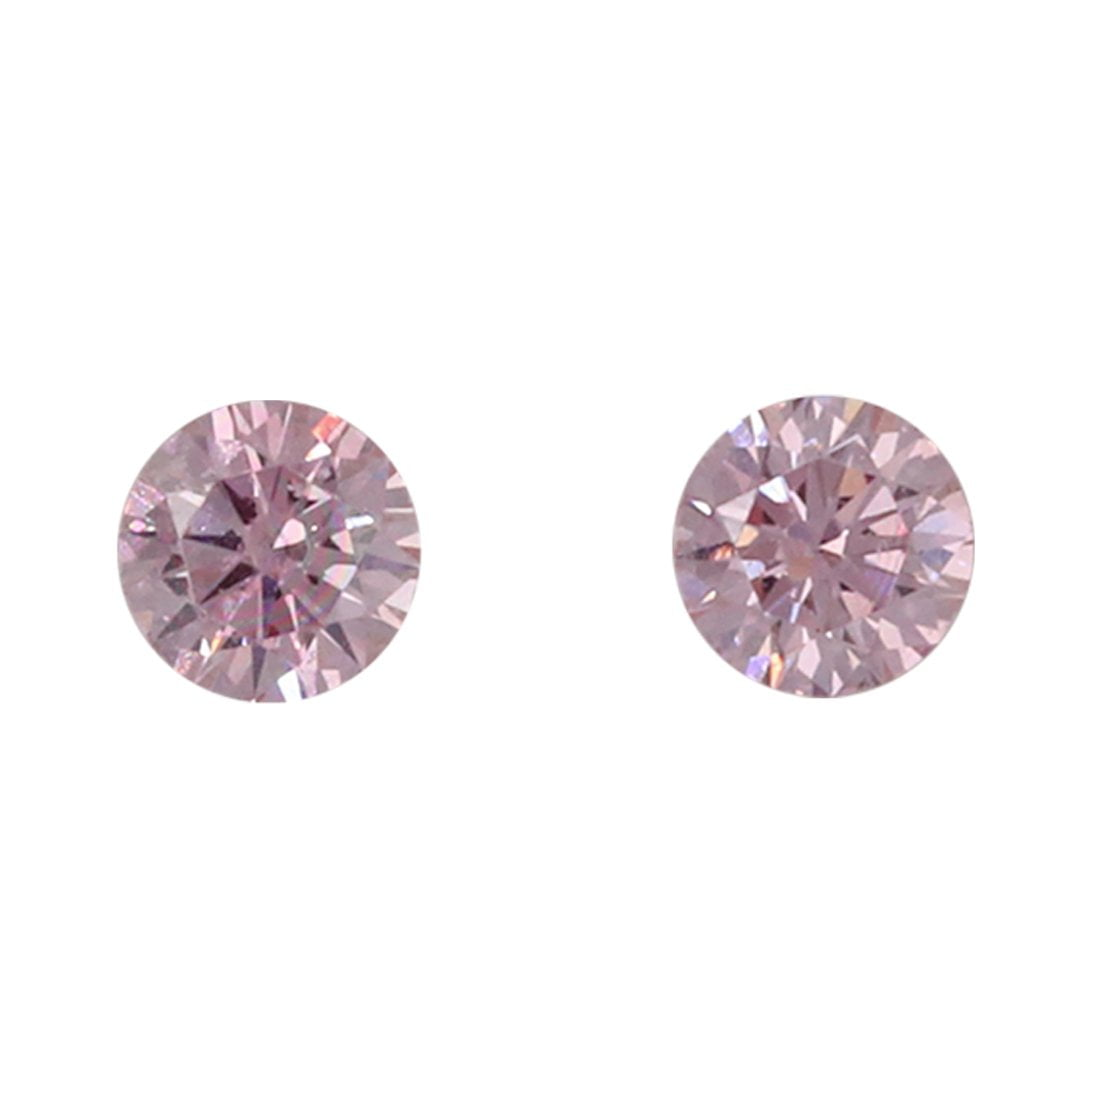 2=0.10ct Natural Fancy Intense Pink, 5P Argyle Diamond